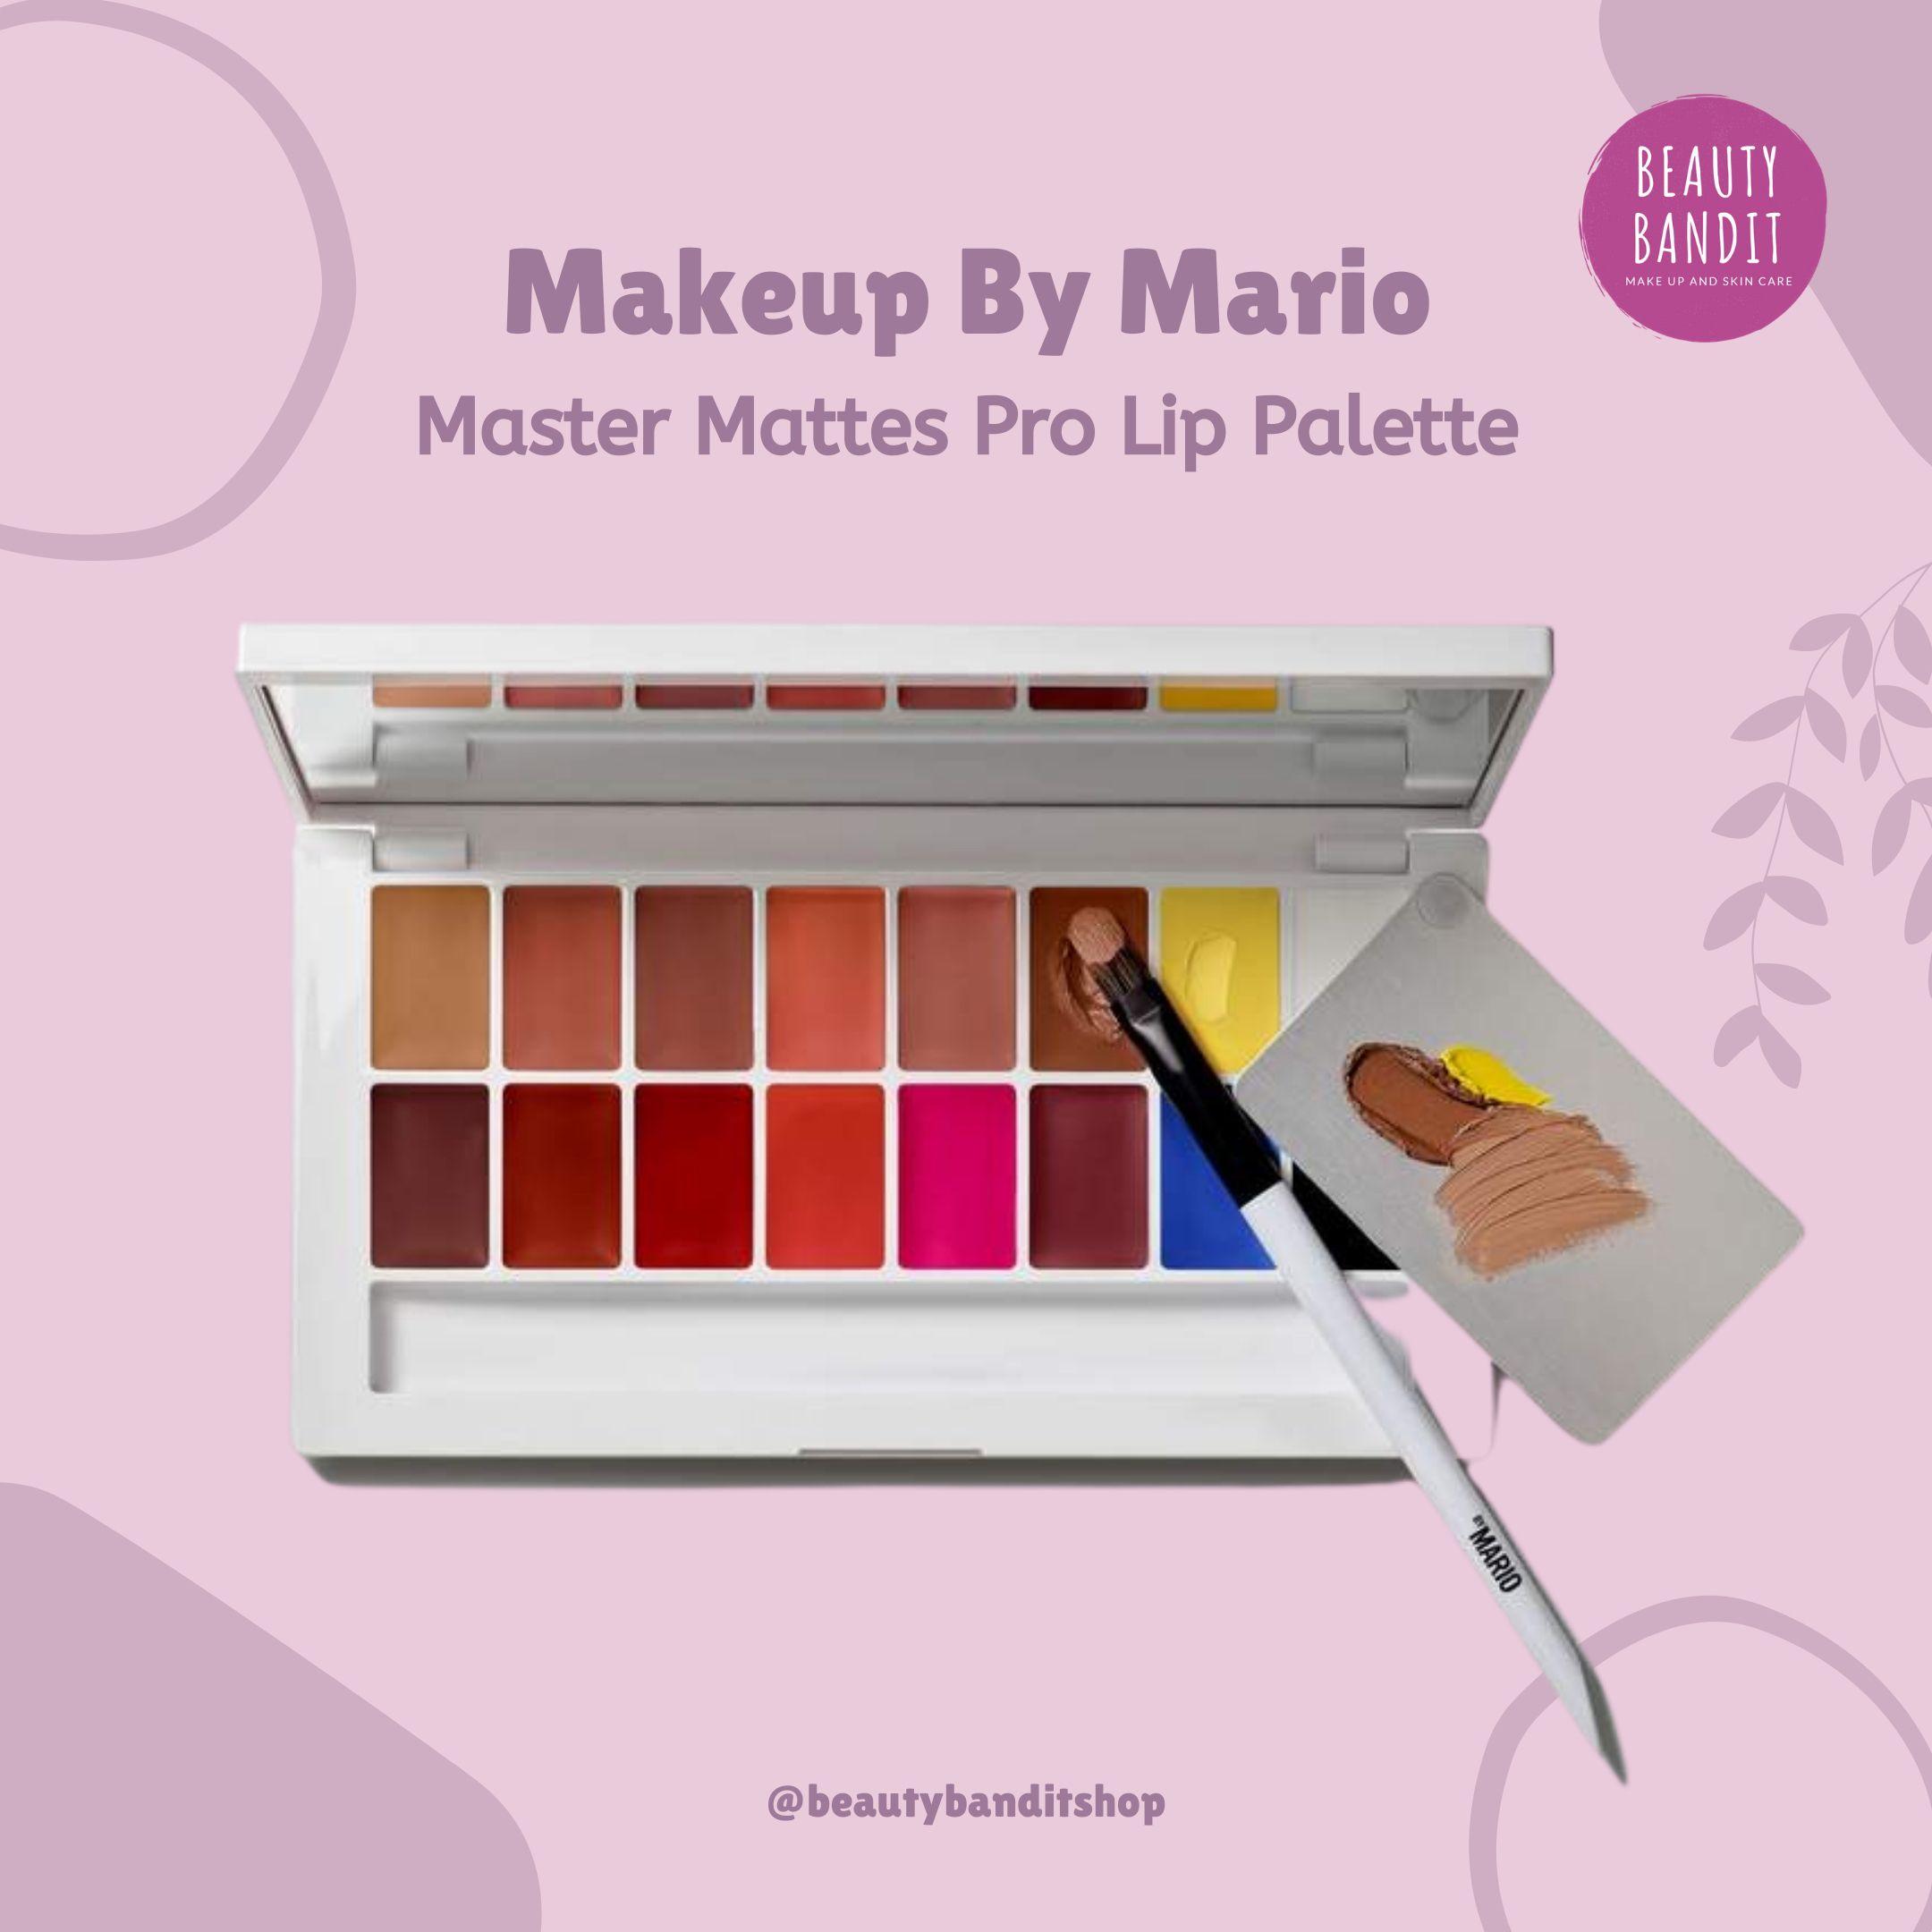 Makeup By Mario Master Mattes Pro Lip Palette thumbnail